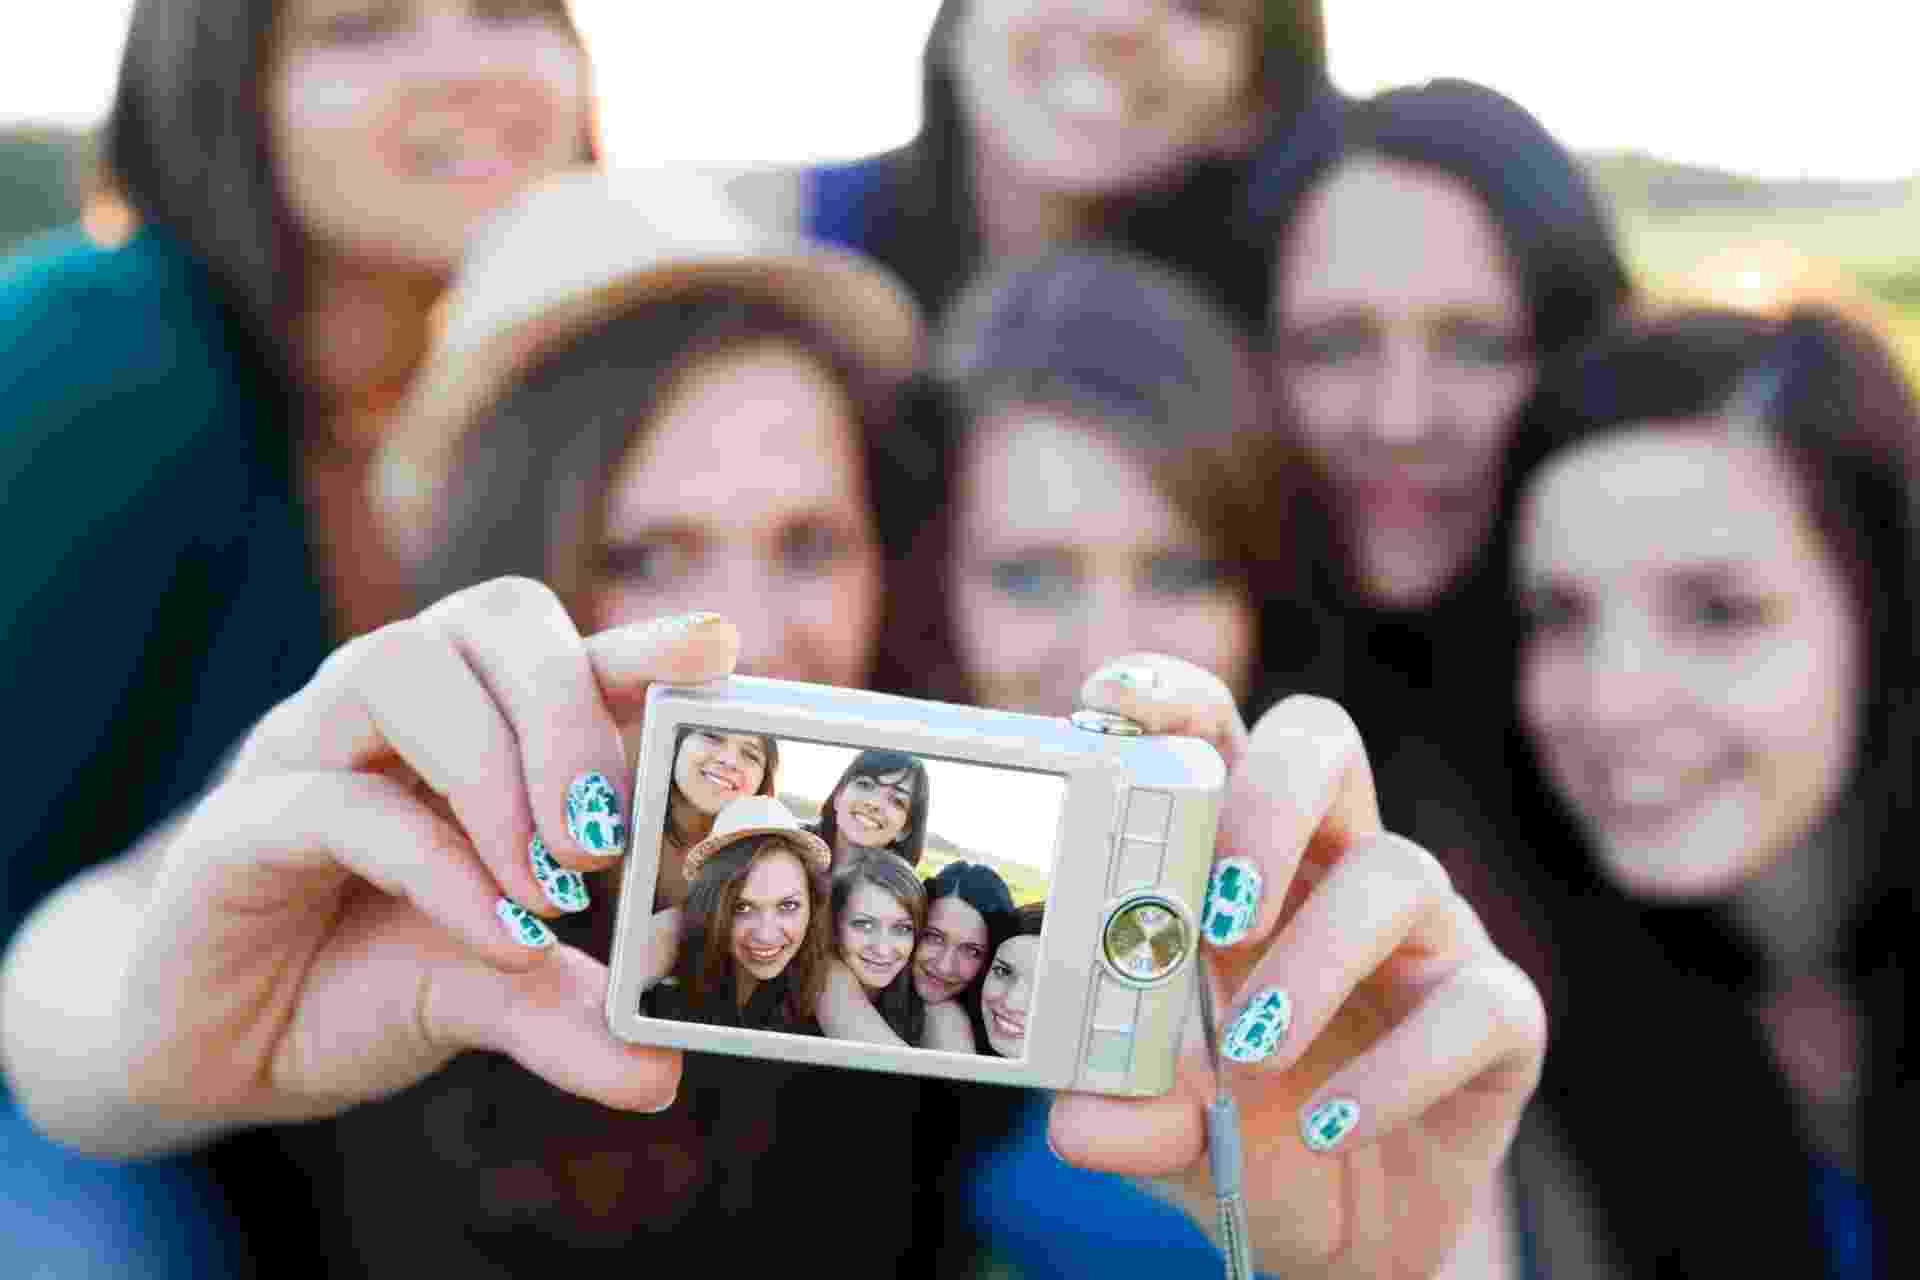 grupo amigas fotografia selfie - Thinkstock